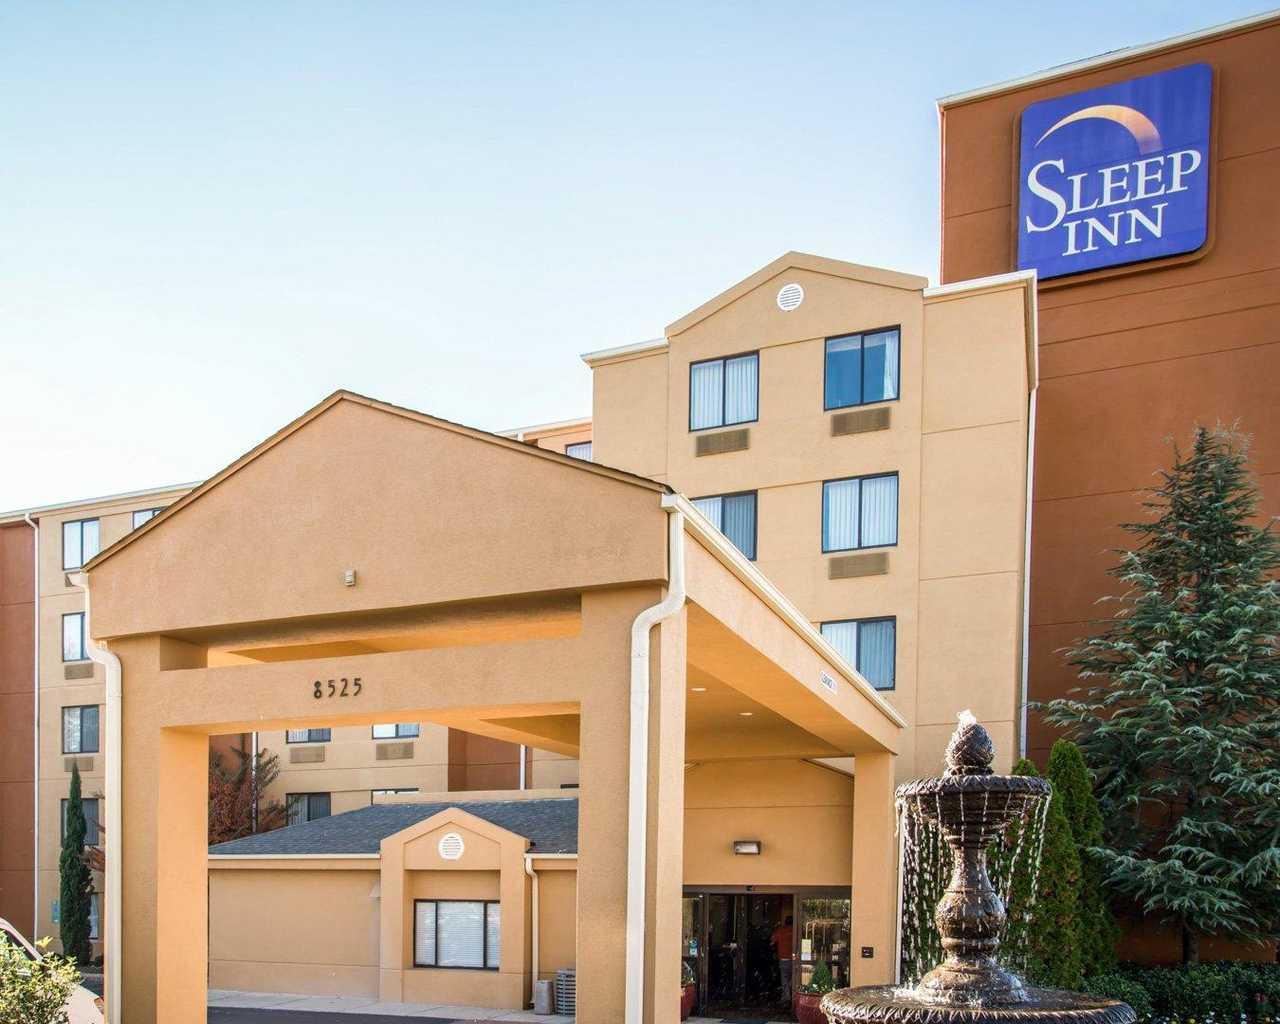 Sleep Inn University Place - Exterior-2